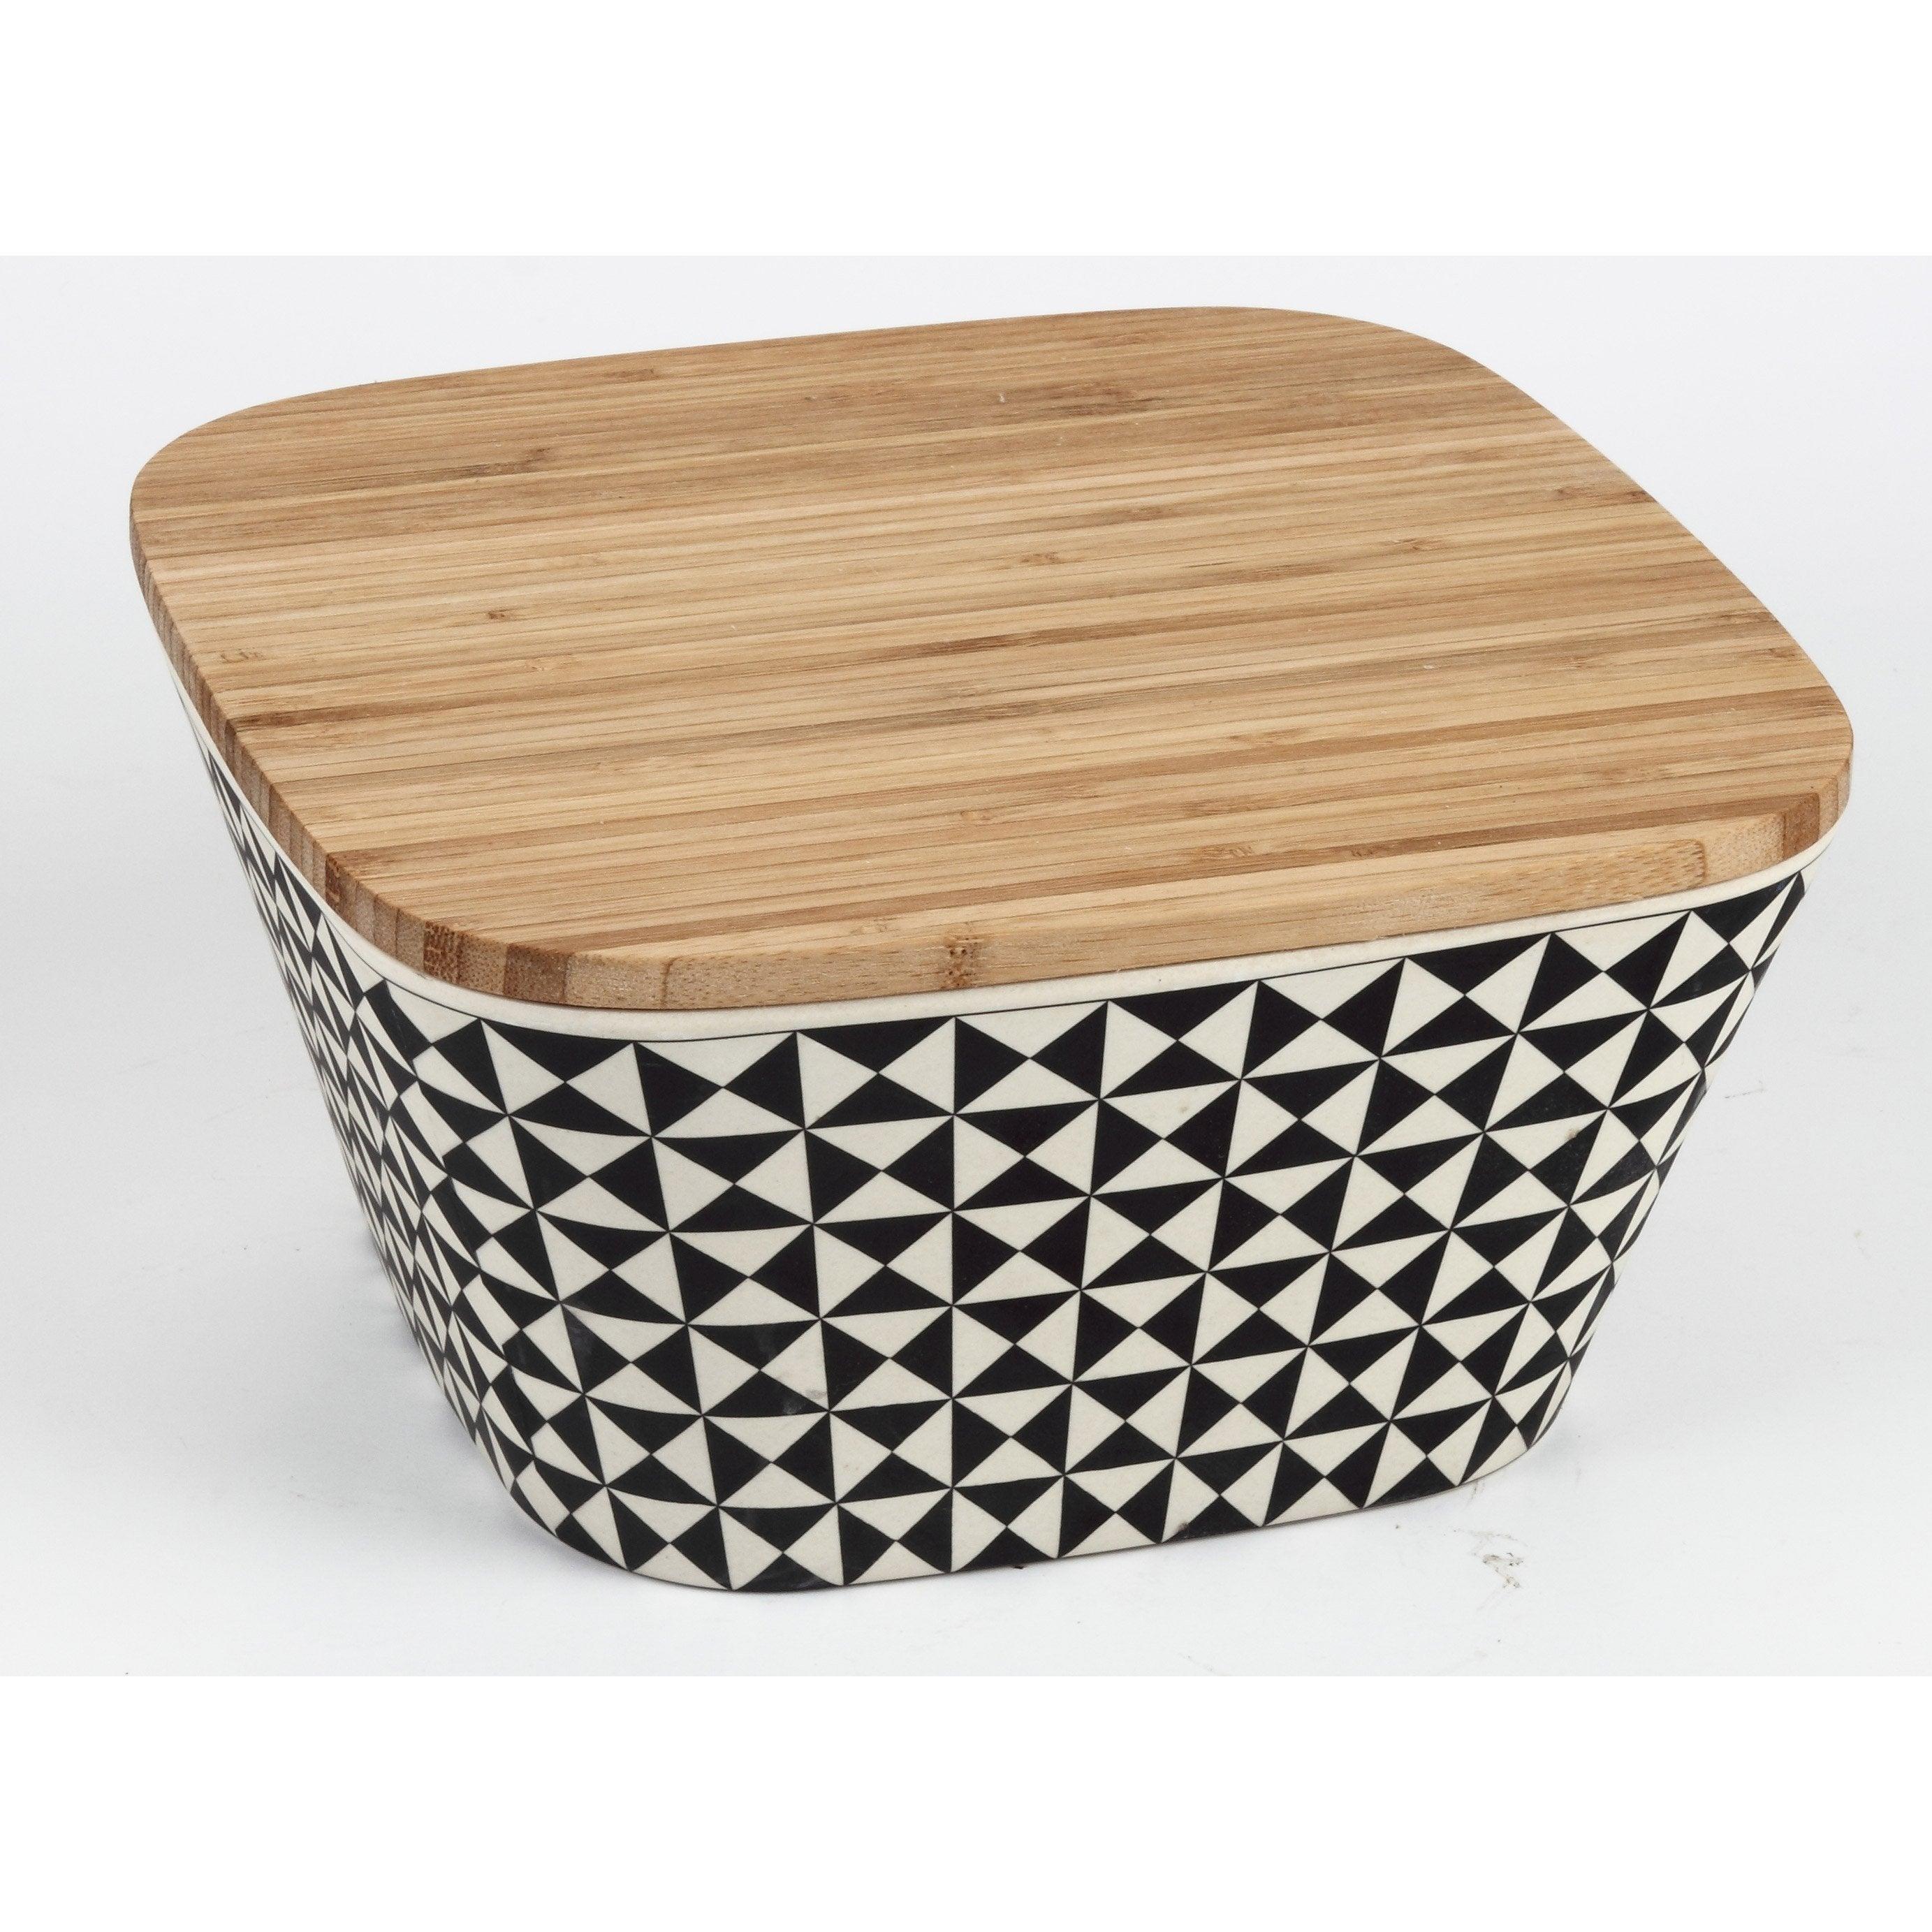 Boîte bambou Hexa blanc/noir H.11.5 x l.22.5 x P.22.5 cm